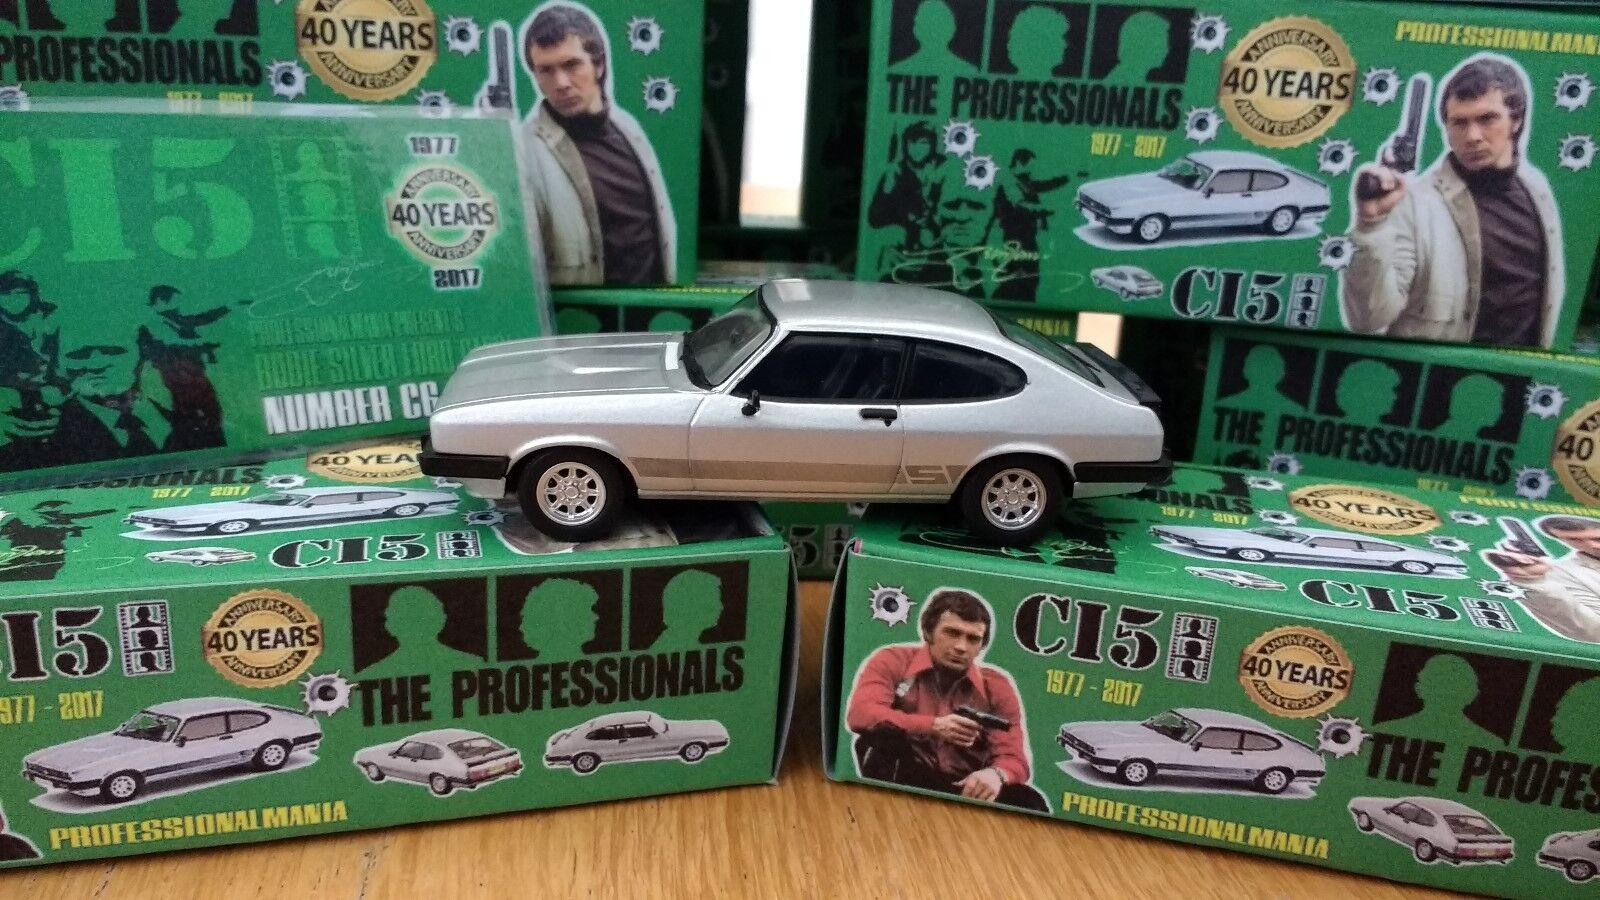 Los profesionales 40TH Aniversario argento Ford Capri 3.0s